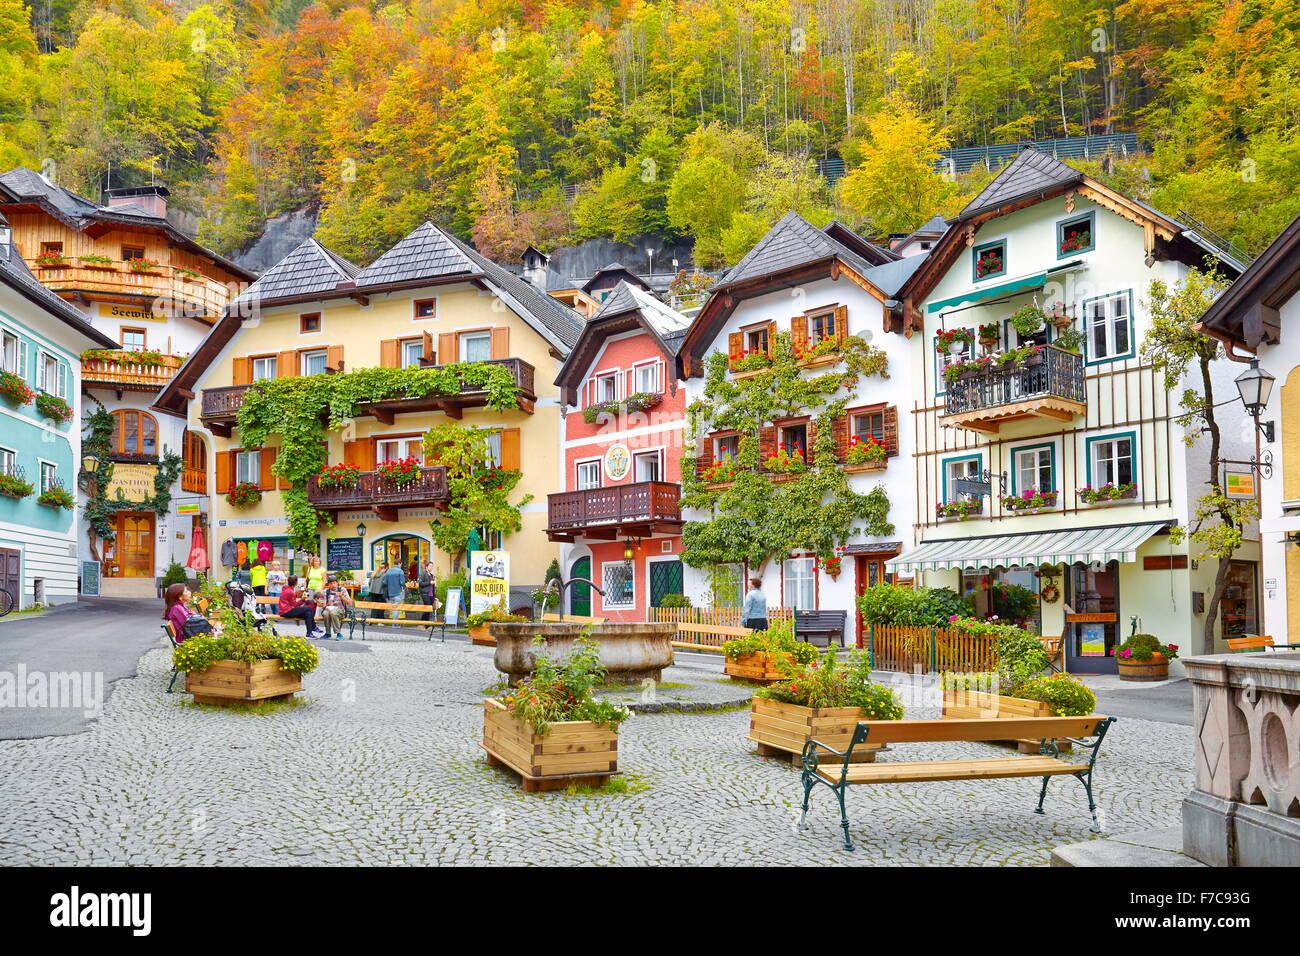 Casas coloridas, Hallstatt village, Salzkammergut, Austria Imagen De Stock